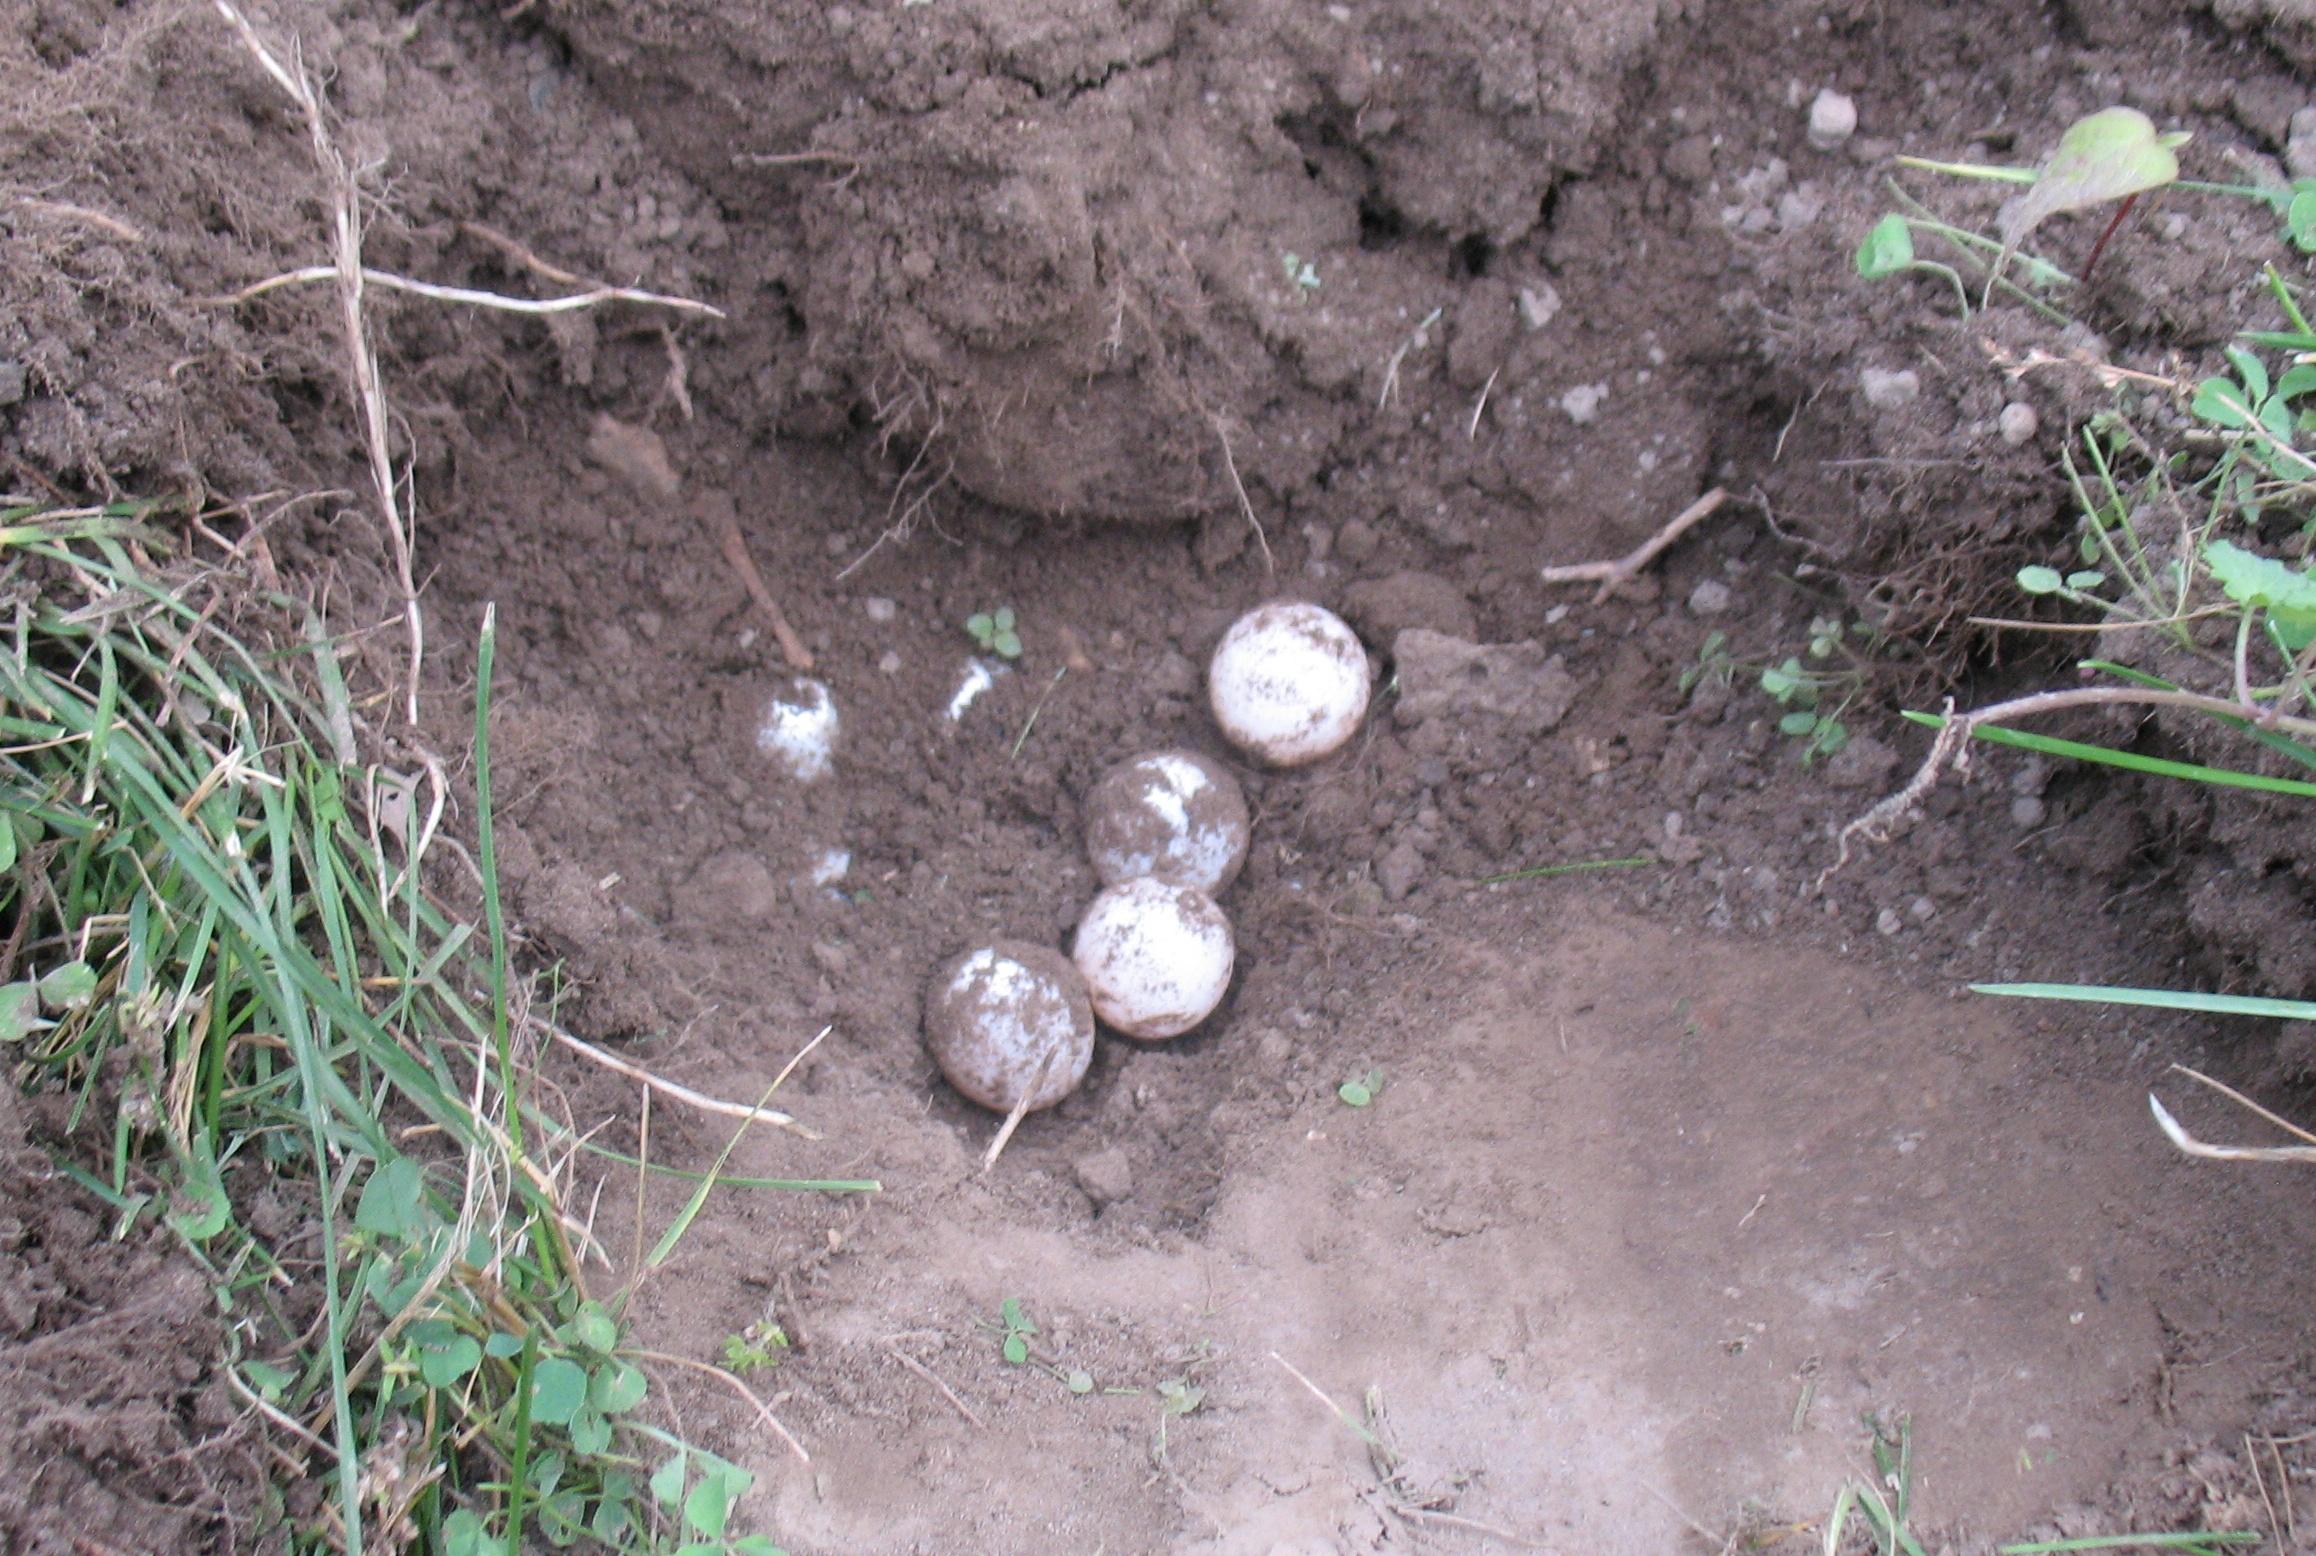 Turtle number 3's eggs